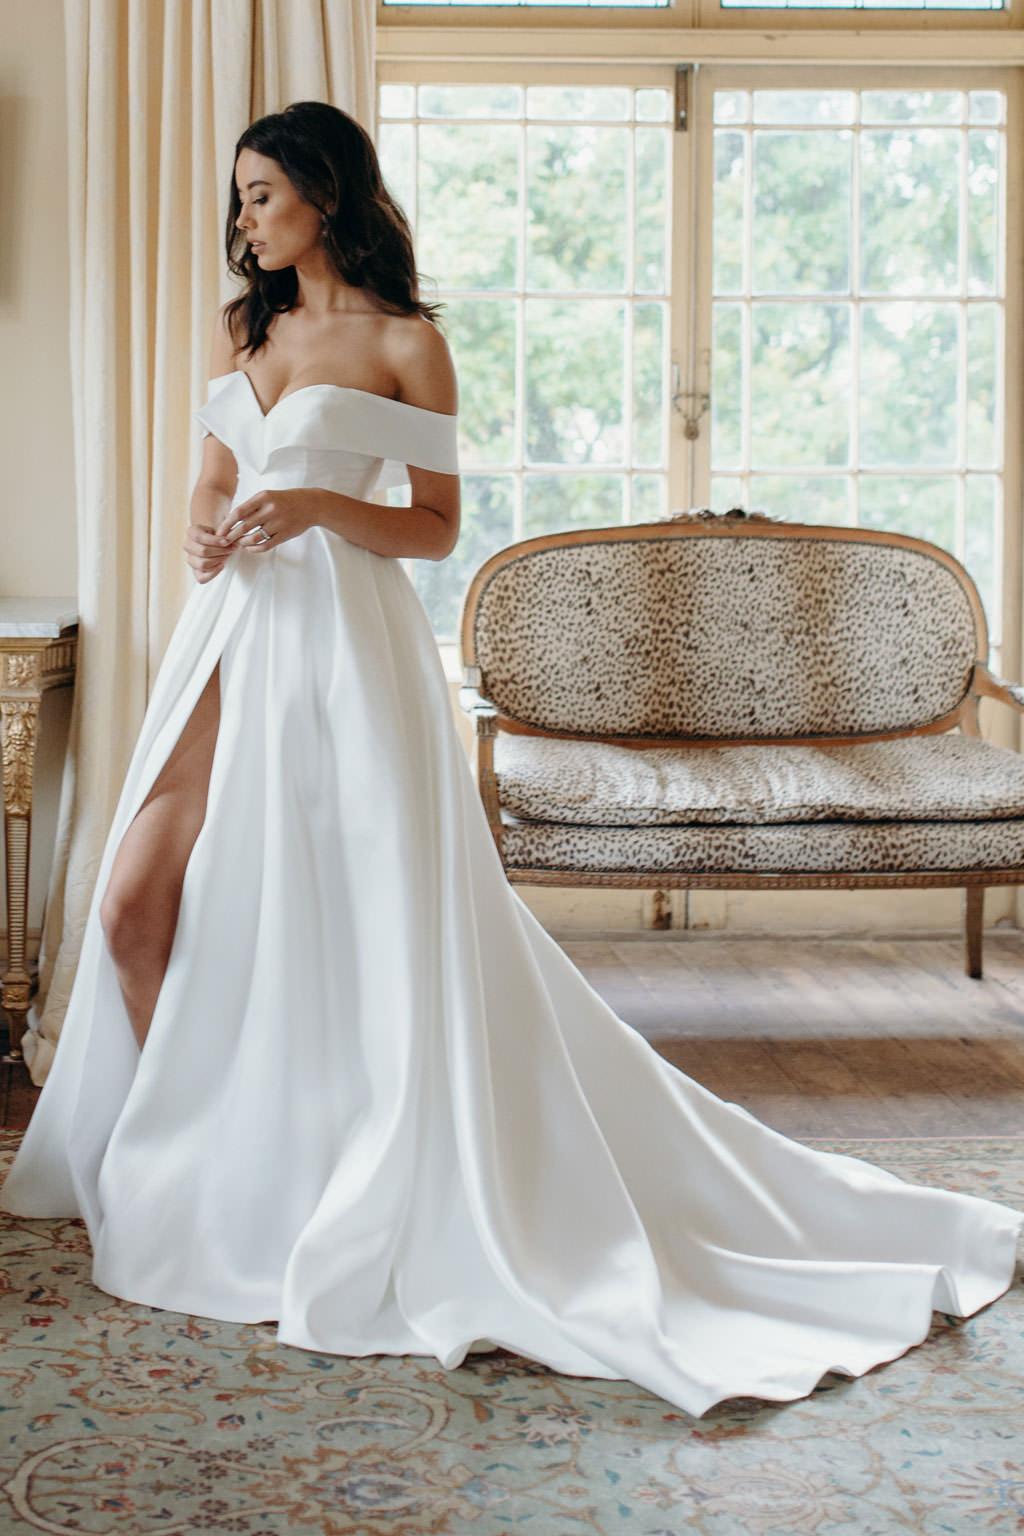 Wedding Dresses Wellington Christchurch Nz Paperswan Bride